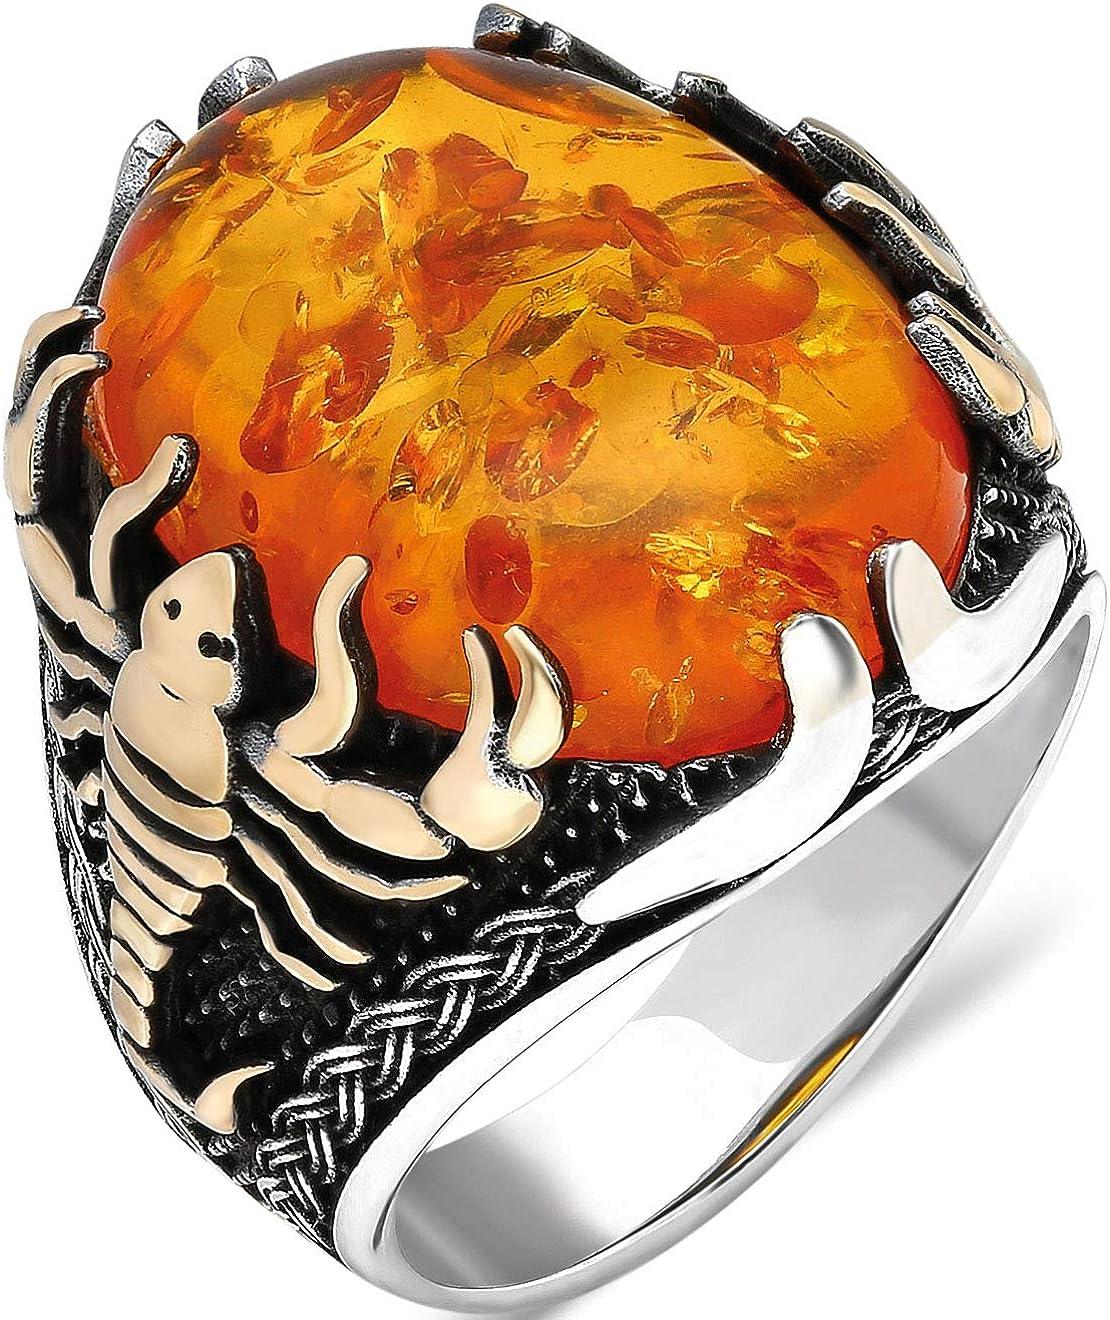 mysilverworld Solid 925 Sterling Silver おトク Amber Scorpion Stone 超人気 Fig